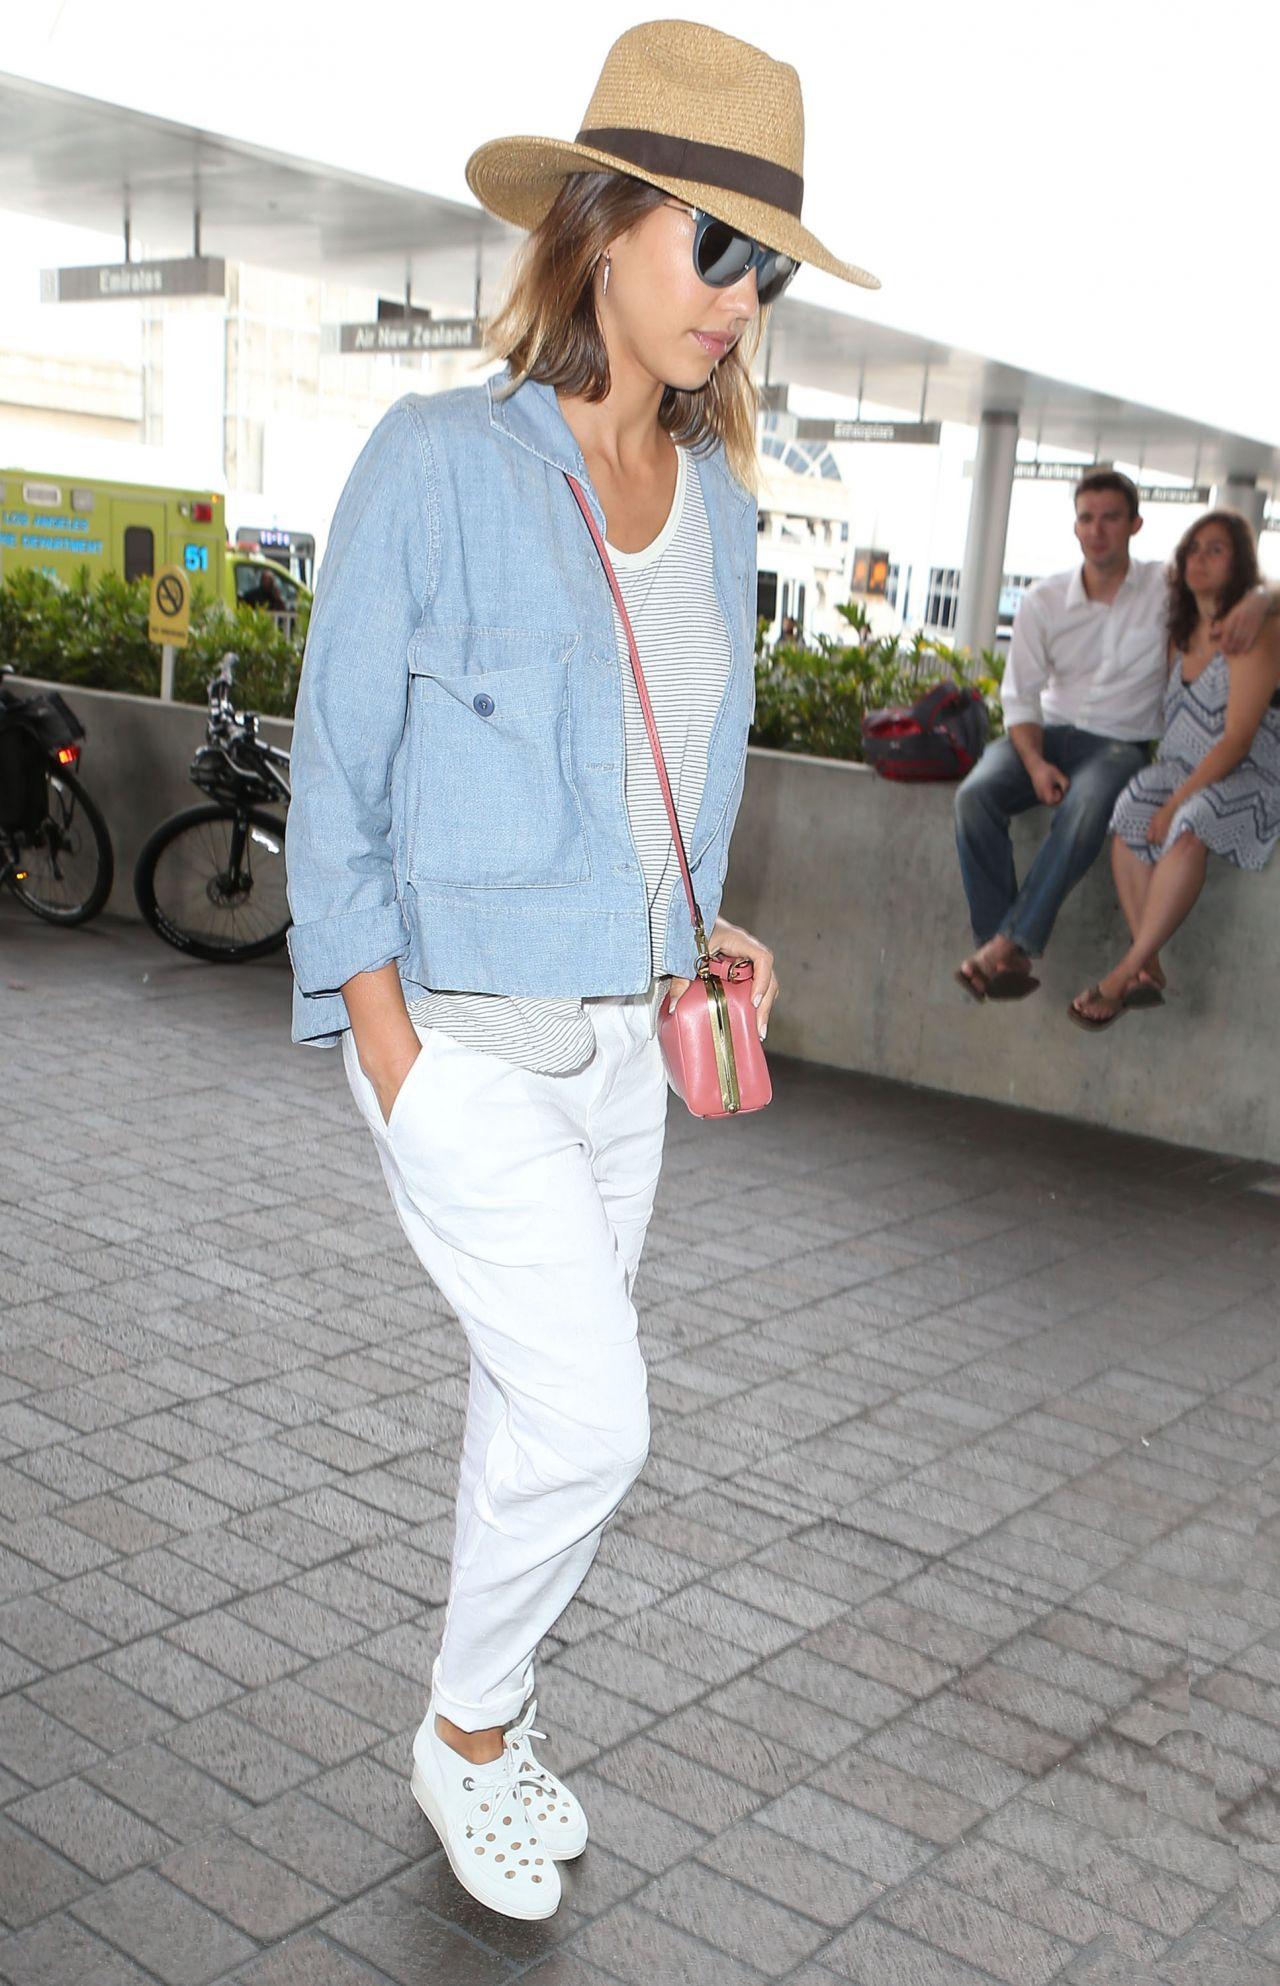 Jessica Alba Airport Fashion - at LAX, July 2015